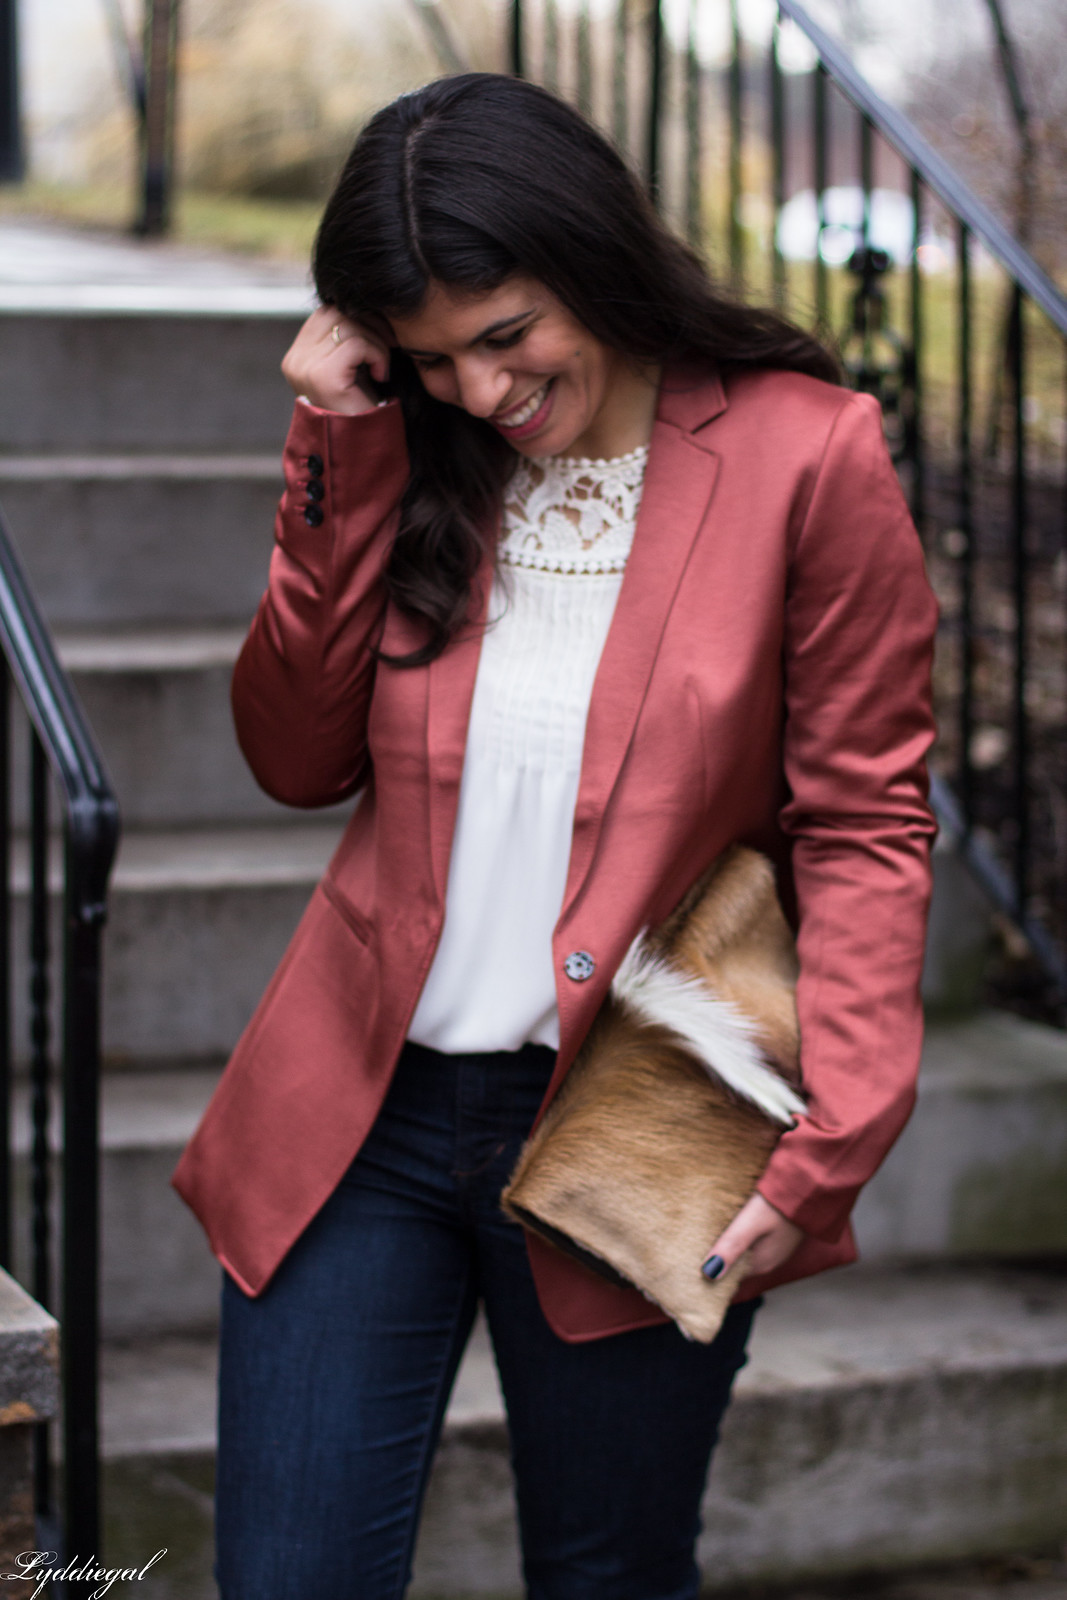 rust silk boyfriend blazer, springbok clutch, lace blouse-17.jpg